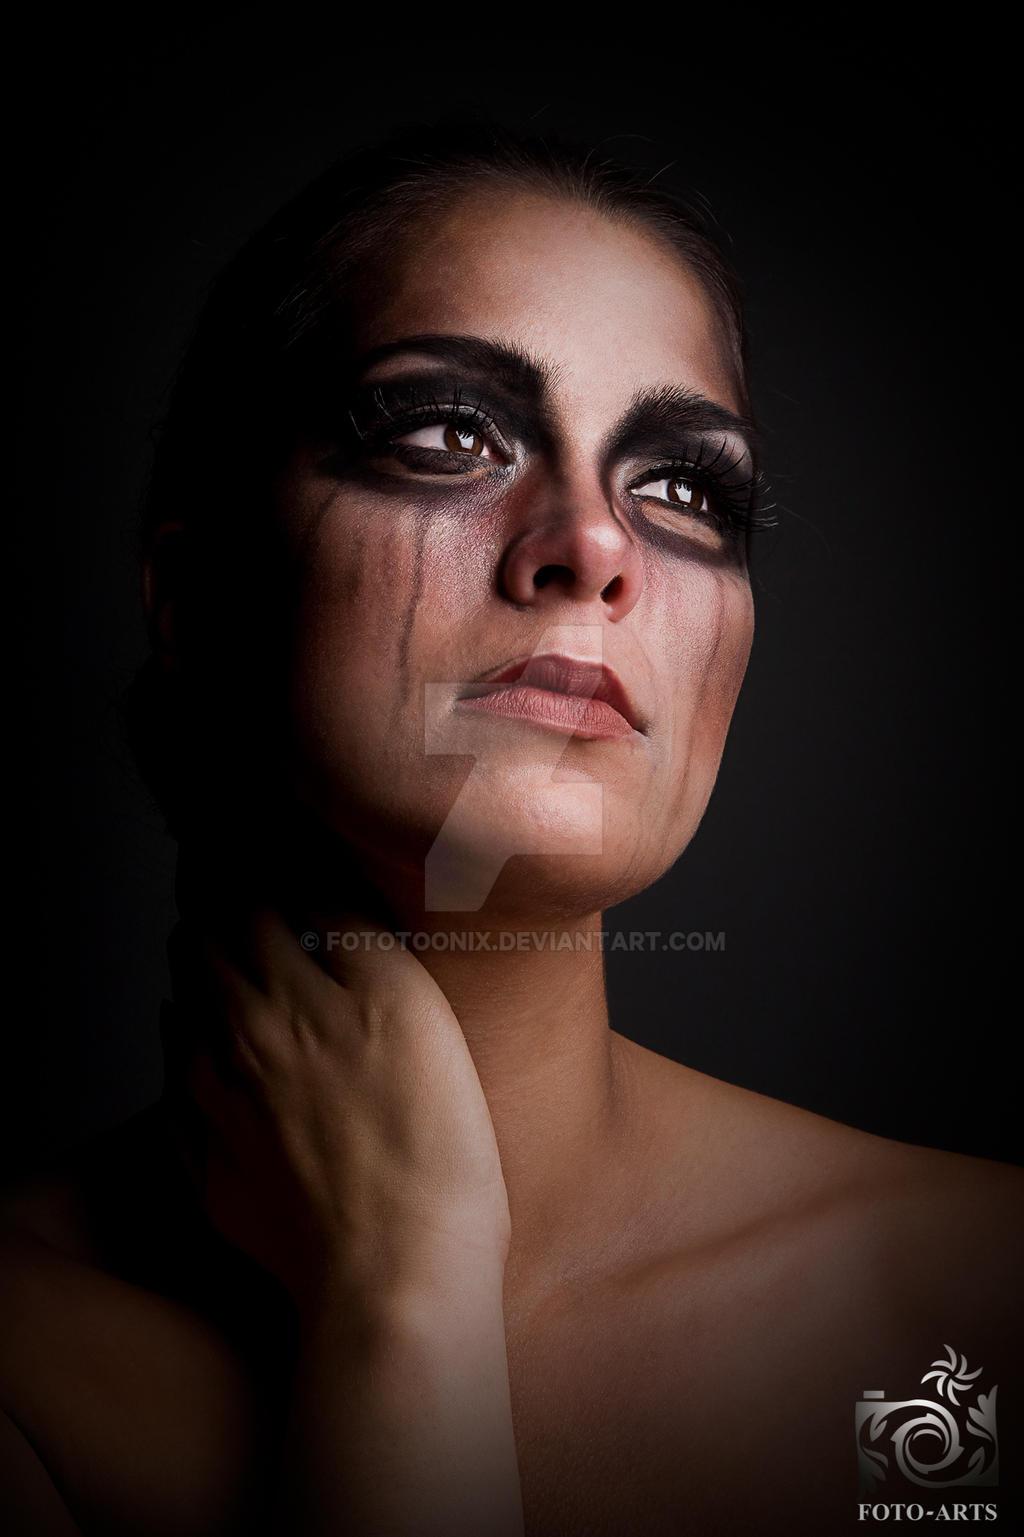 Sadness FotoArts